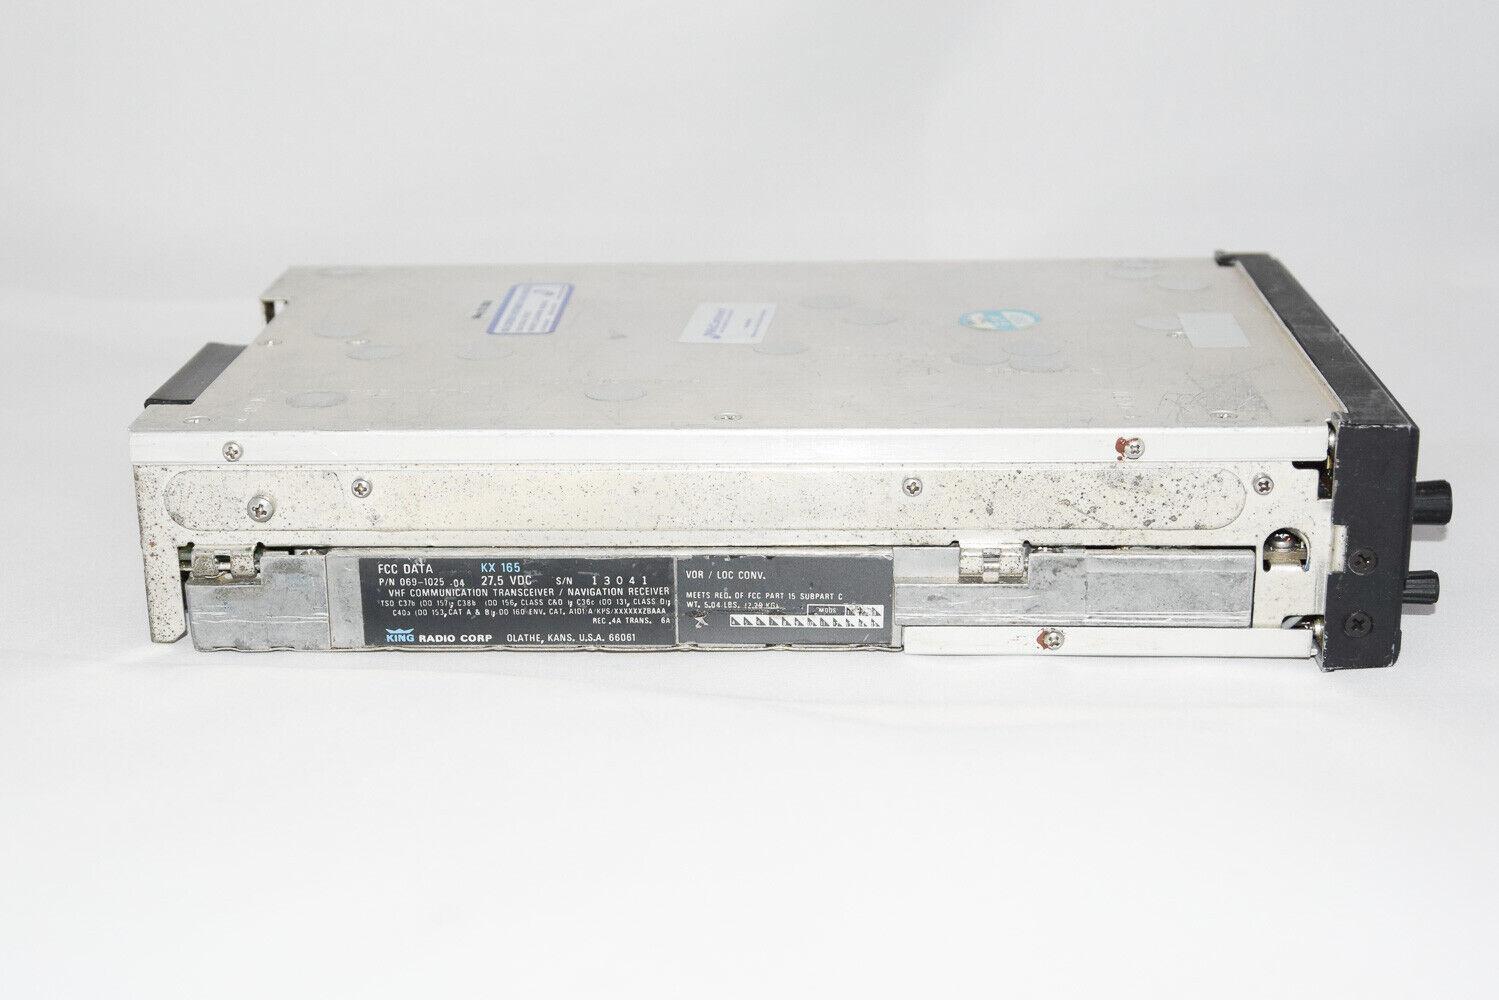 Bendix/King KX-165 28V Nav/Com with 8130 PN: 069-1025-04 SN: 13041